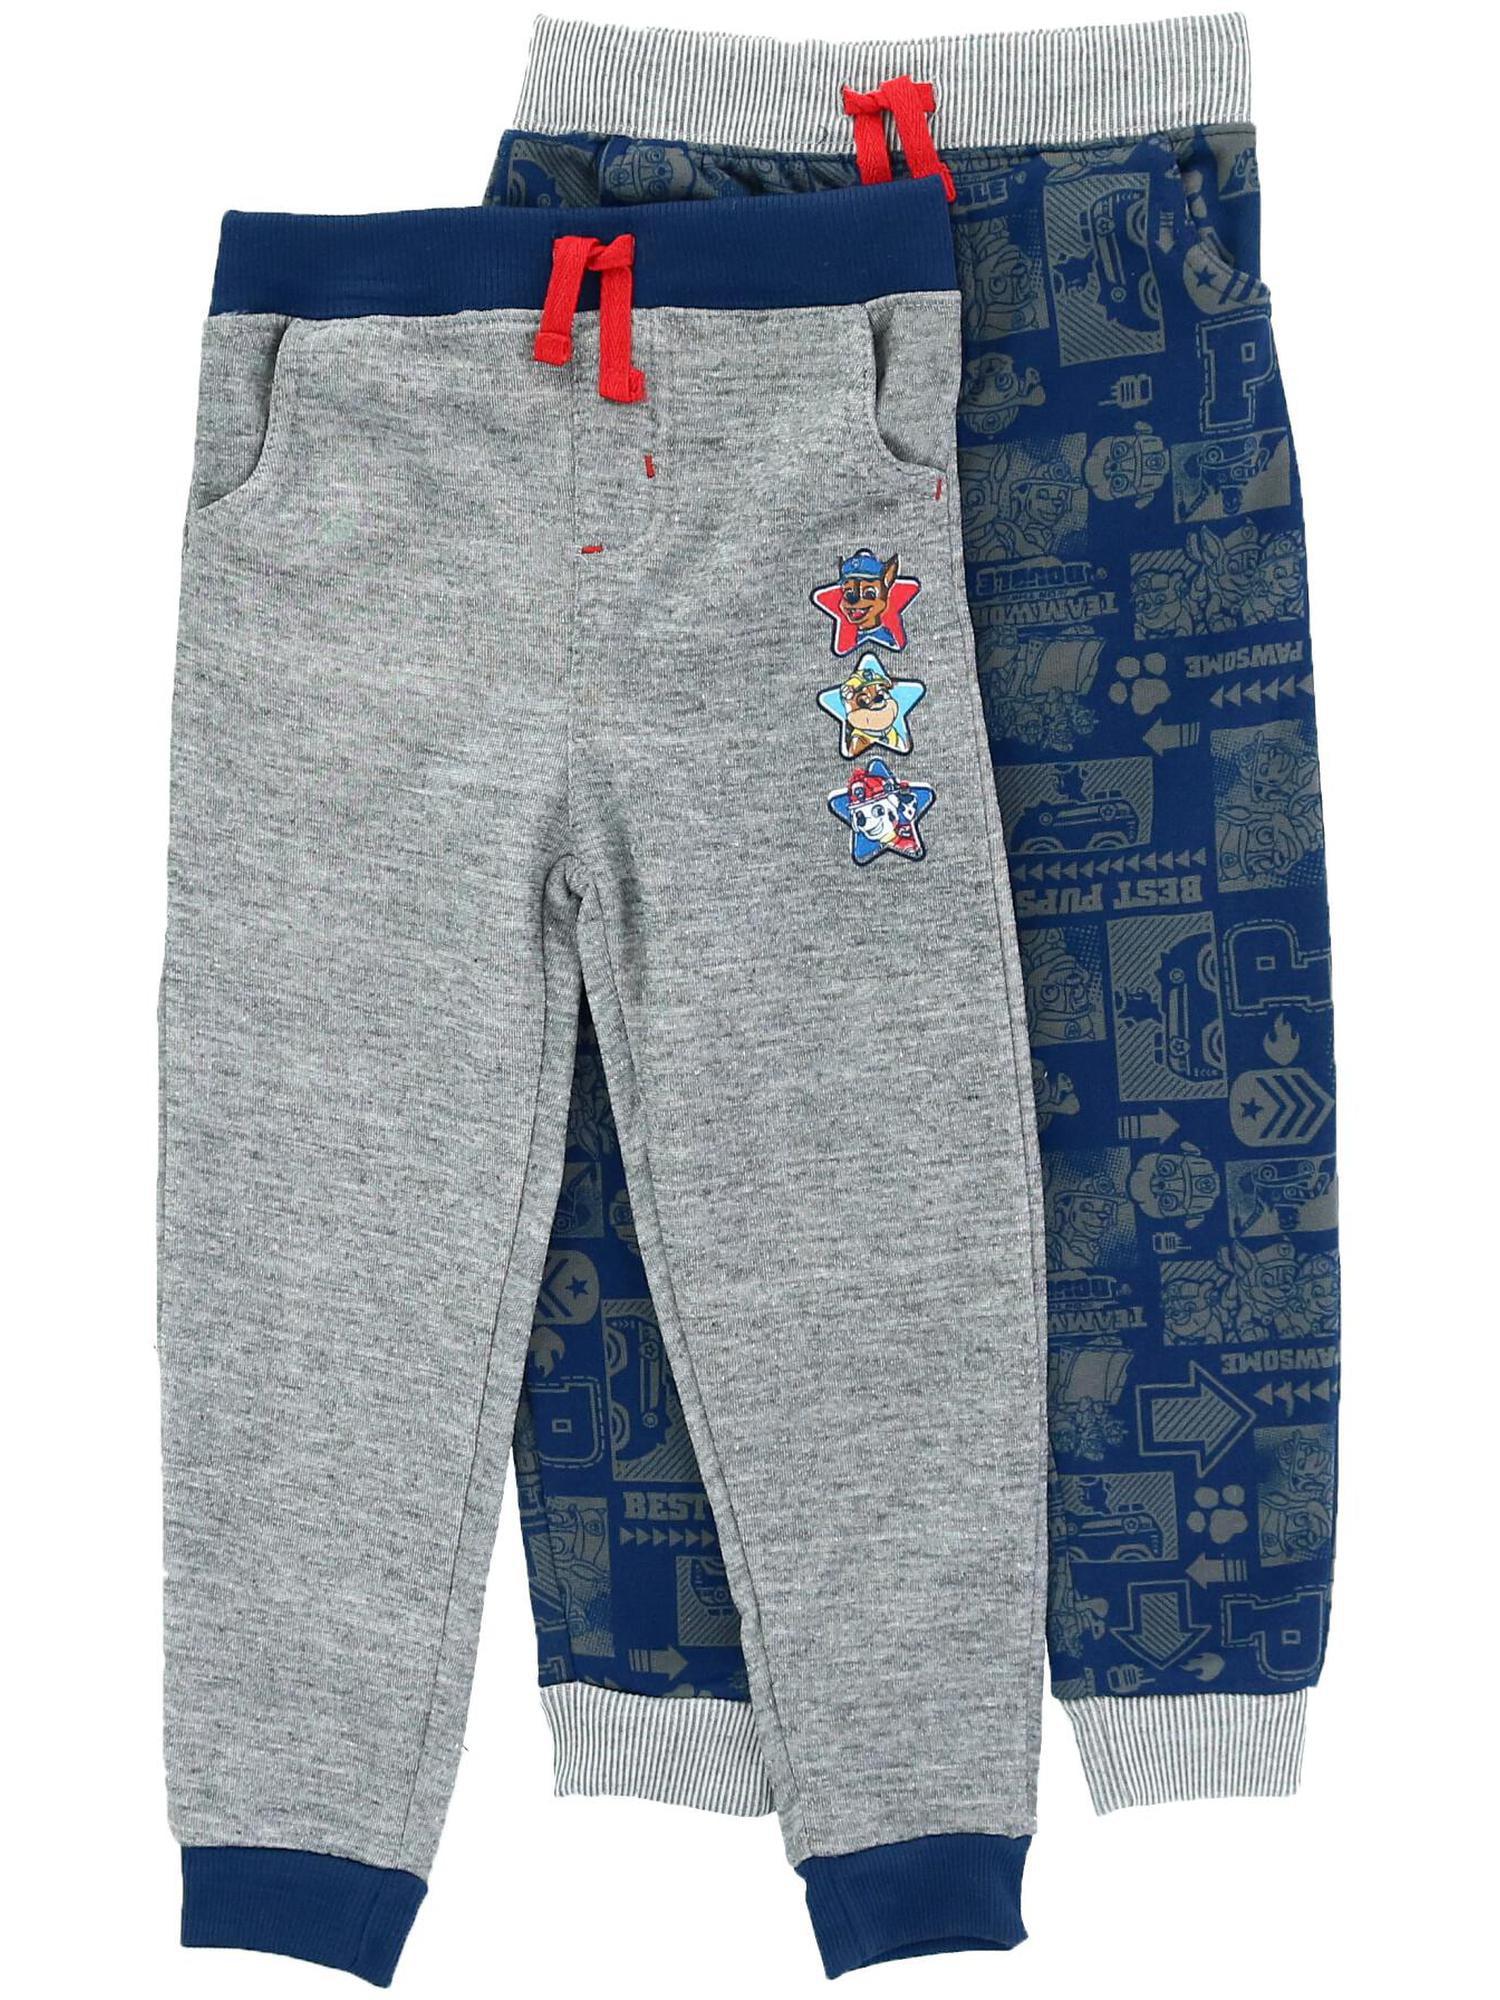 Toddler Paw Patrol Jogger Pants (2 Pair Pack),  Multi